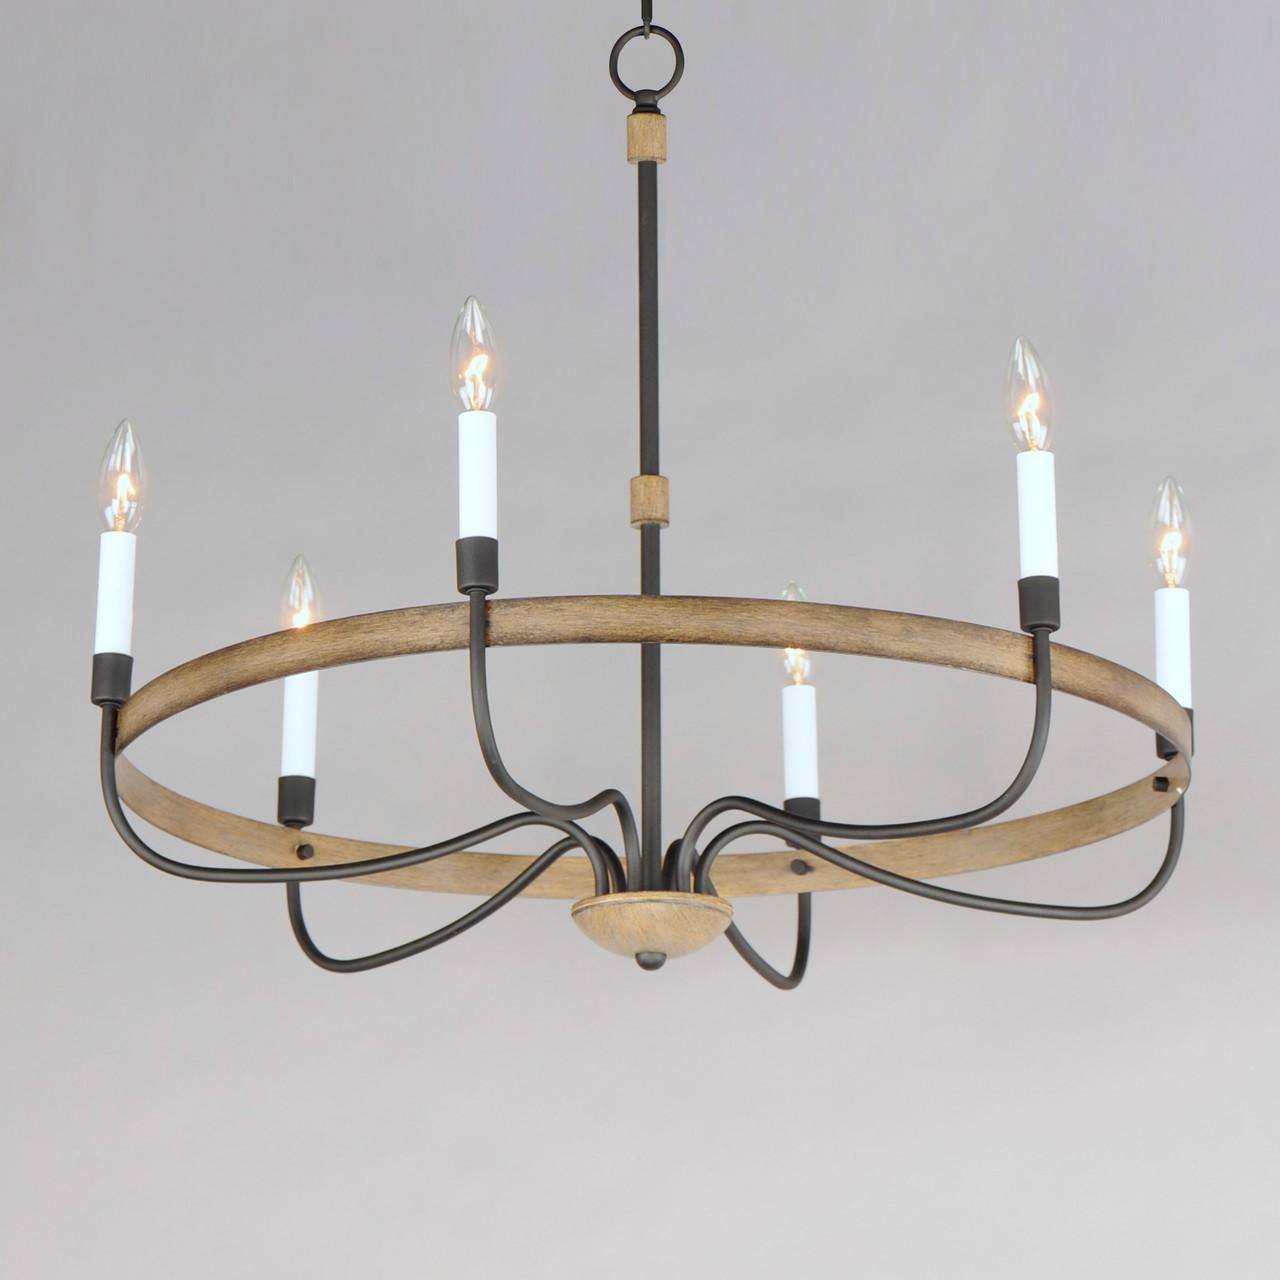 franklin 6 light rustic chandelier by maxim lighting